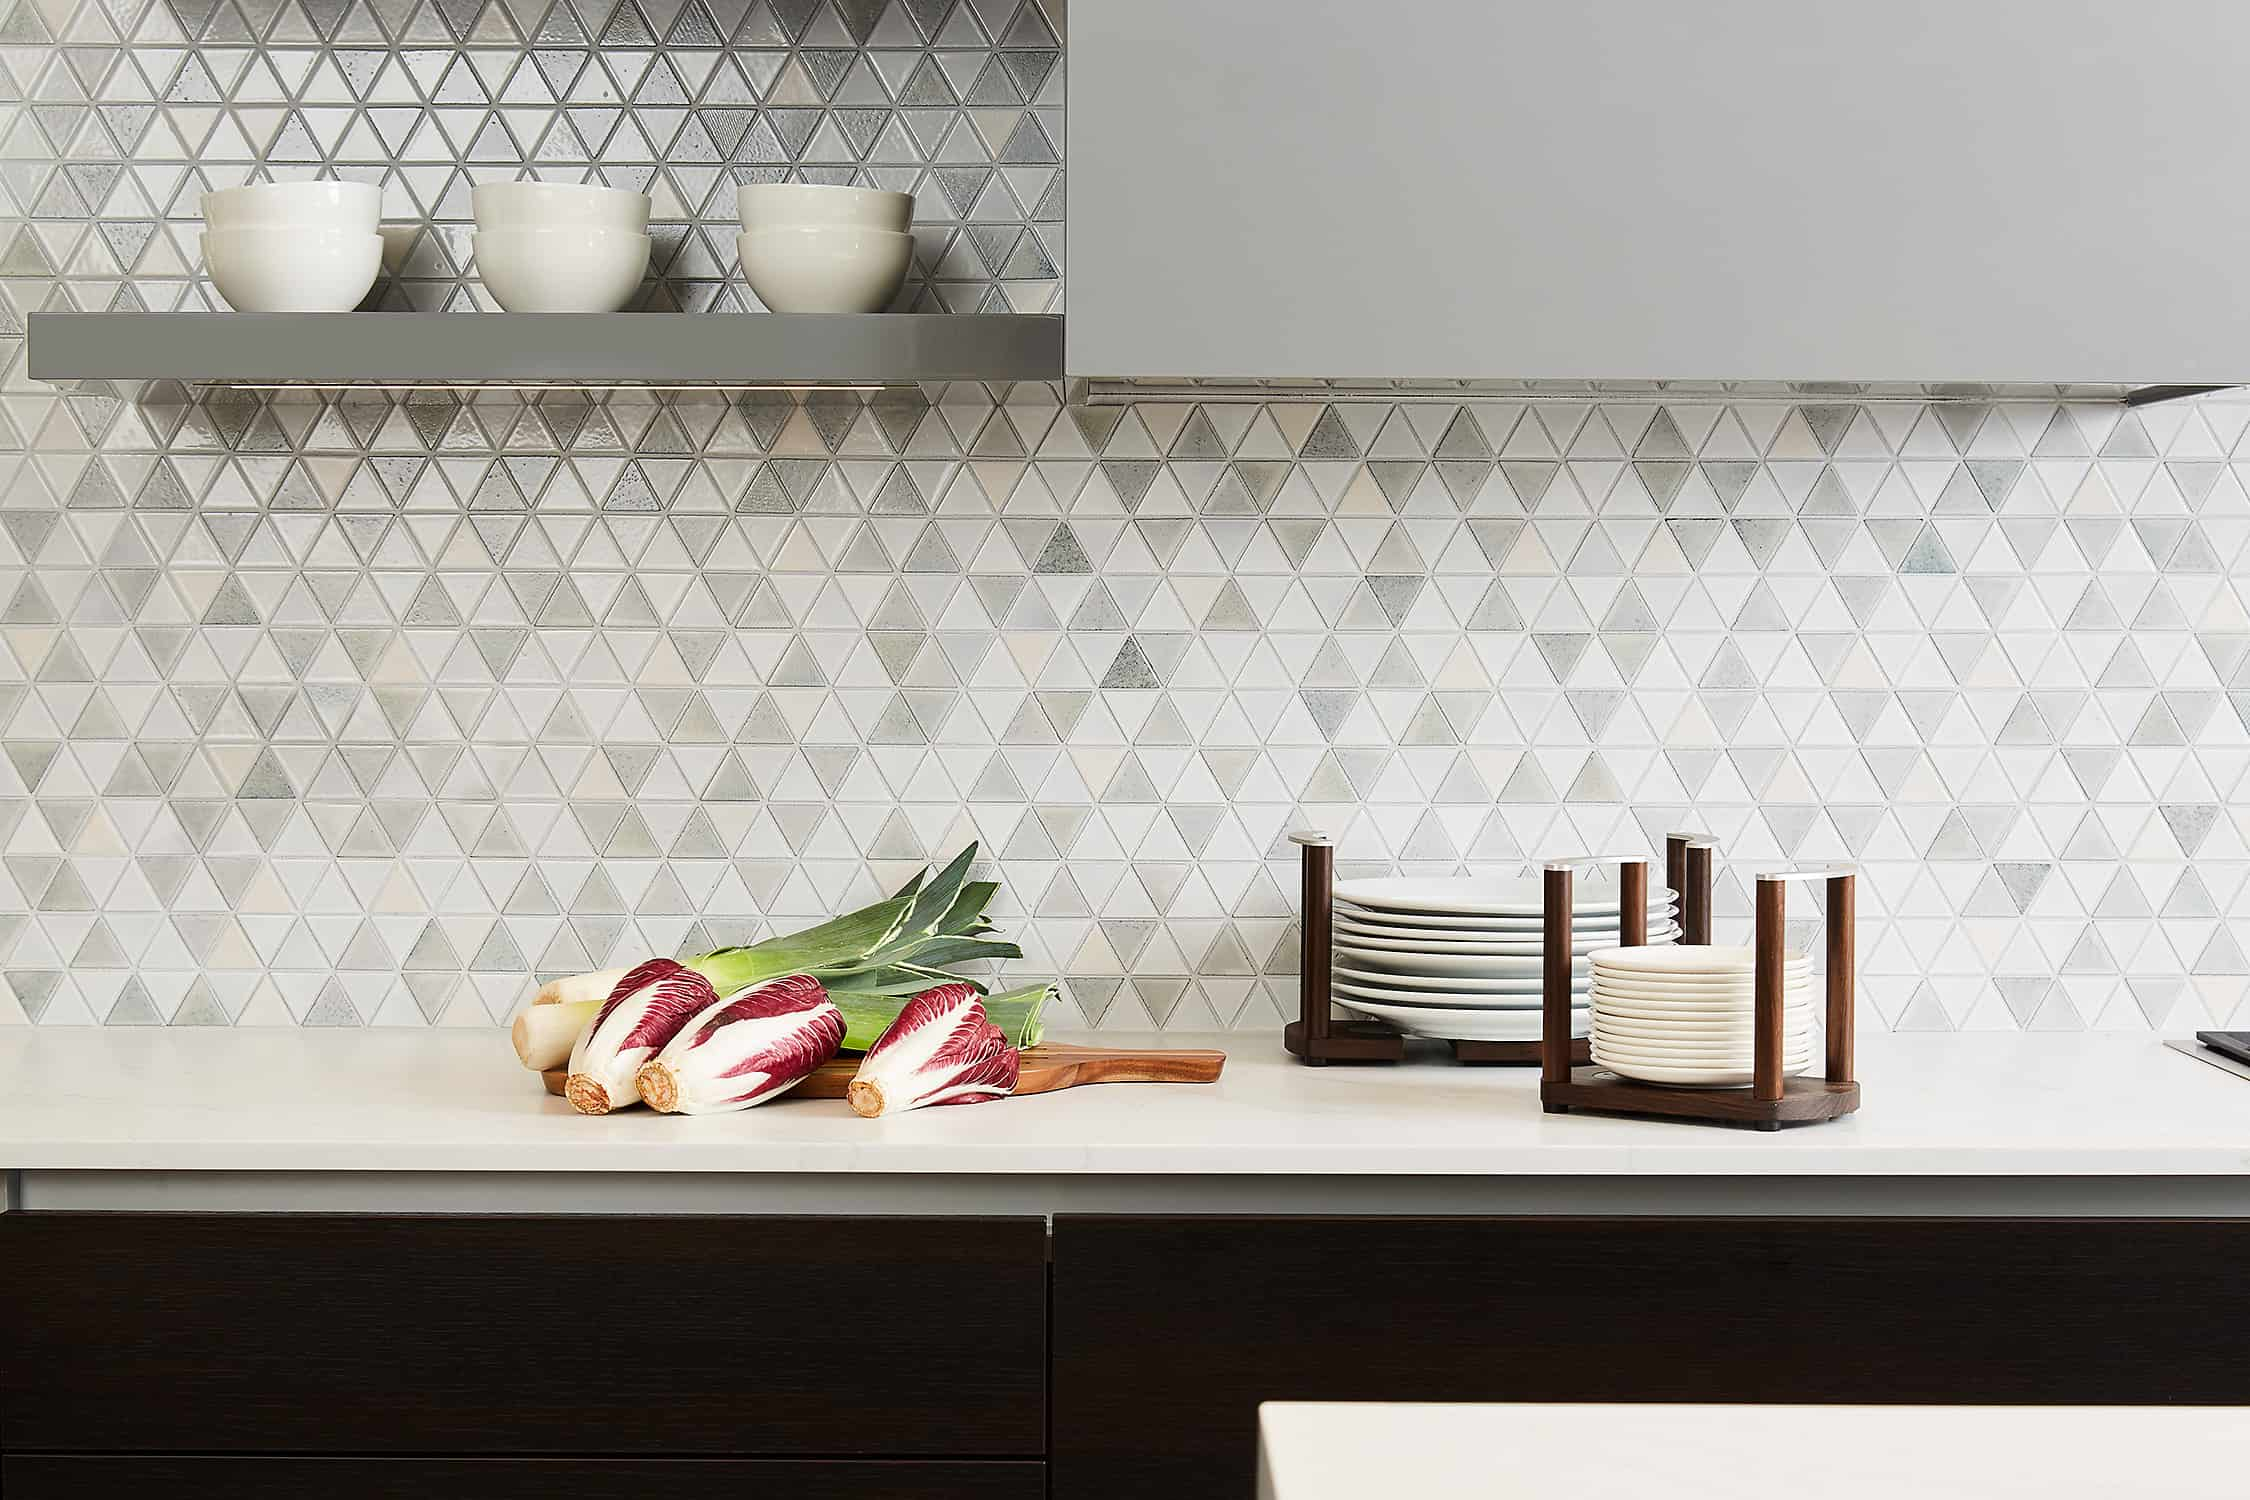 stunning mosaic backsplash of the moussa kitchen project completed by eggersmann la